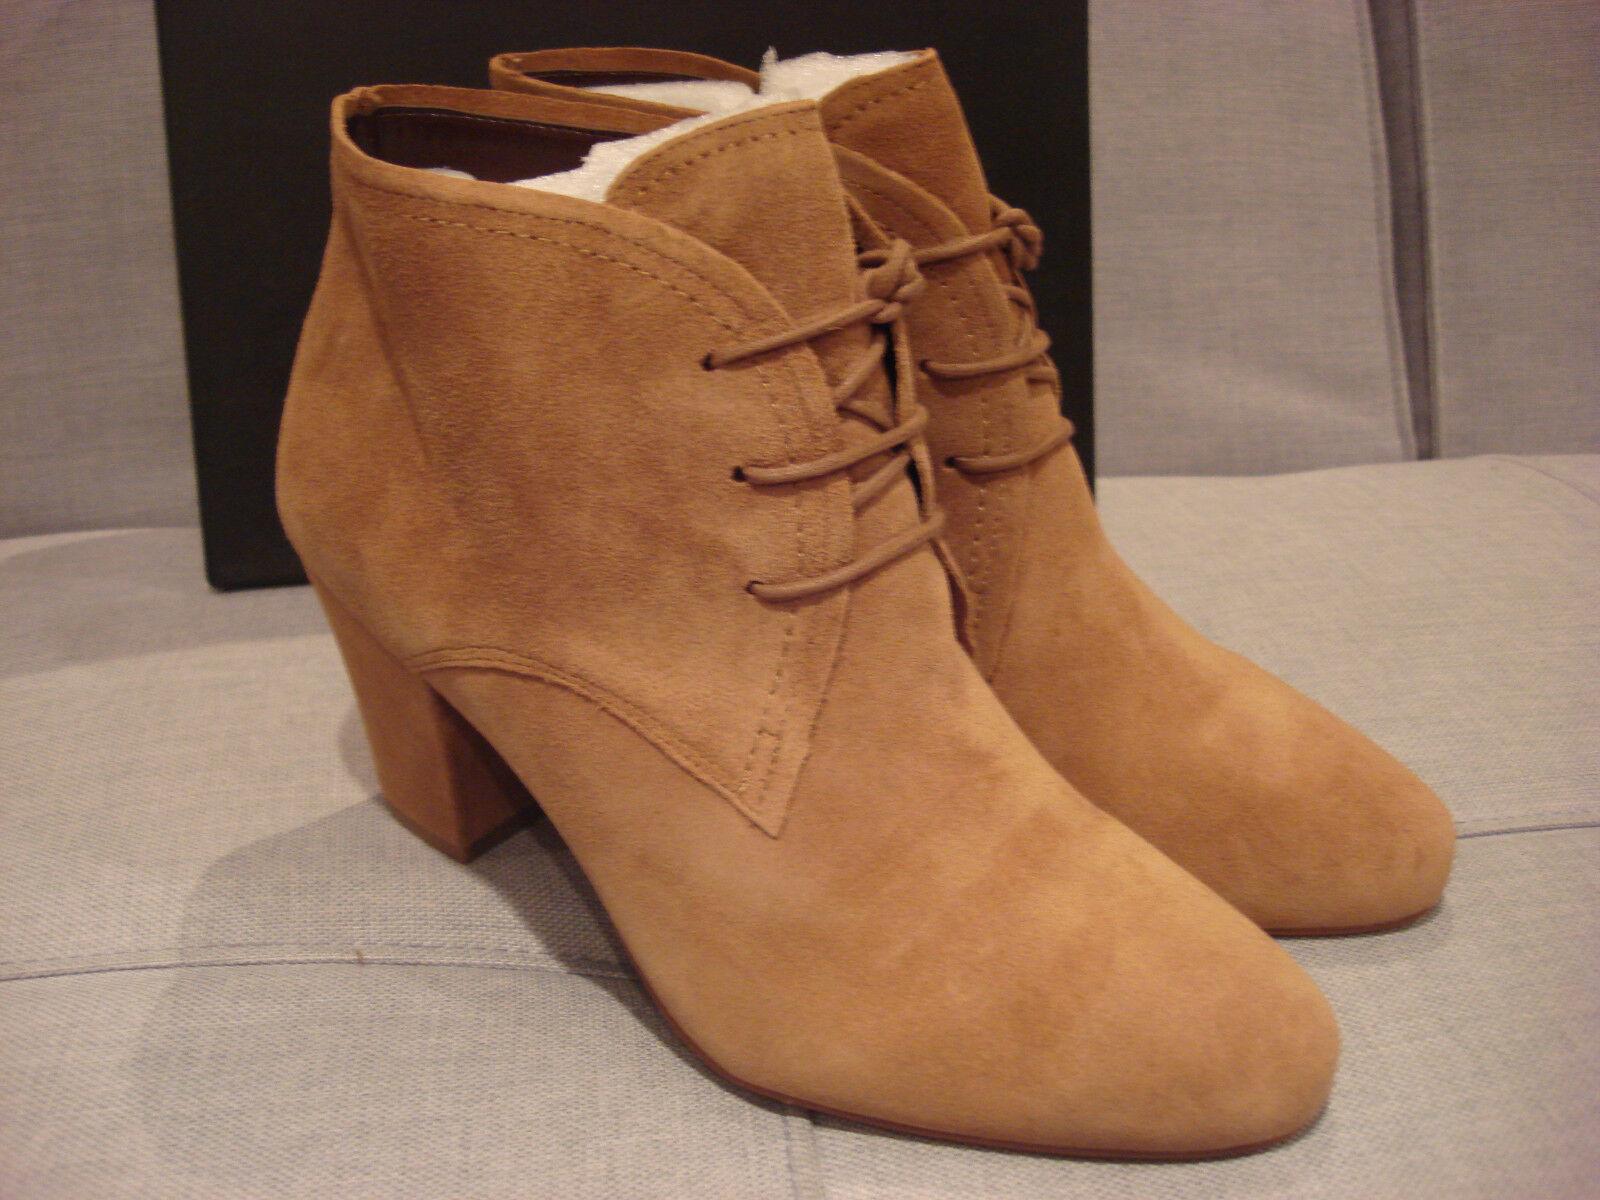 BCBG WOMEN'S DELPHINE BOOTS Schuhe SANDALWOOD OIL CALF SUEDE SIZE 10 - BRAND NEU